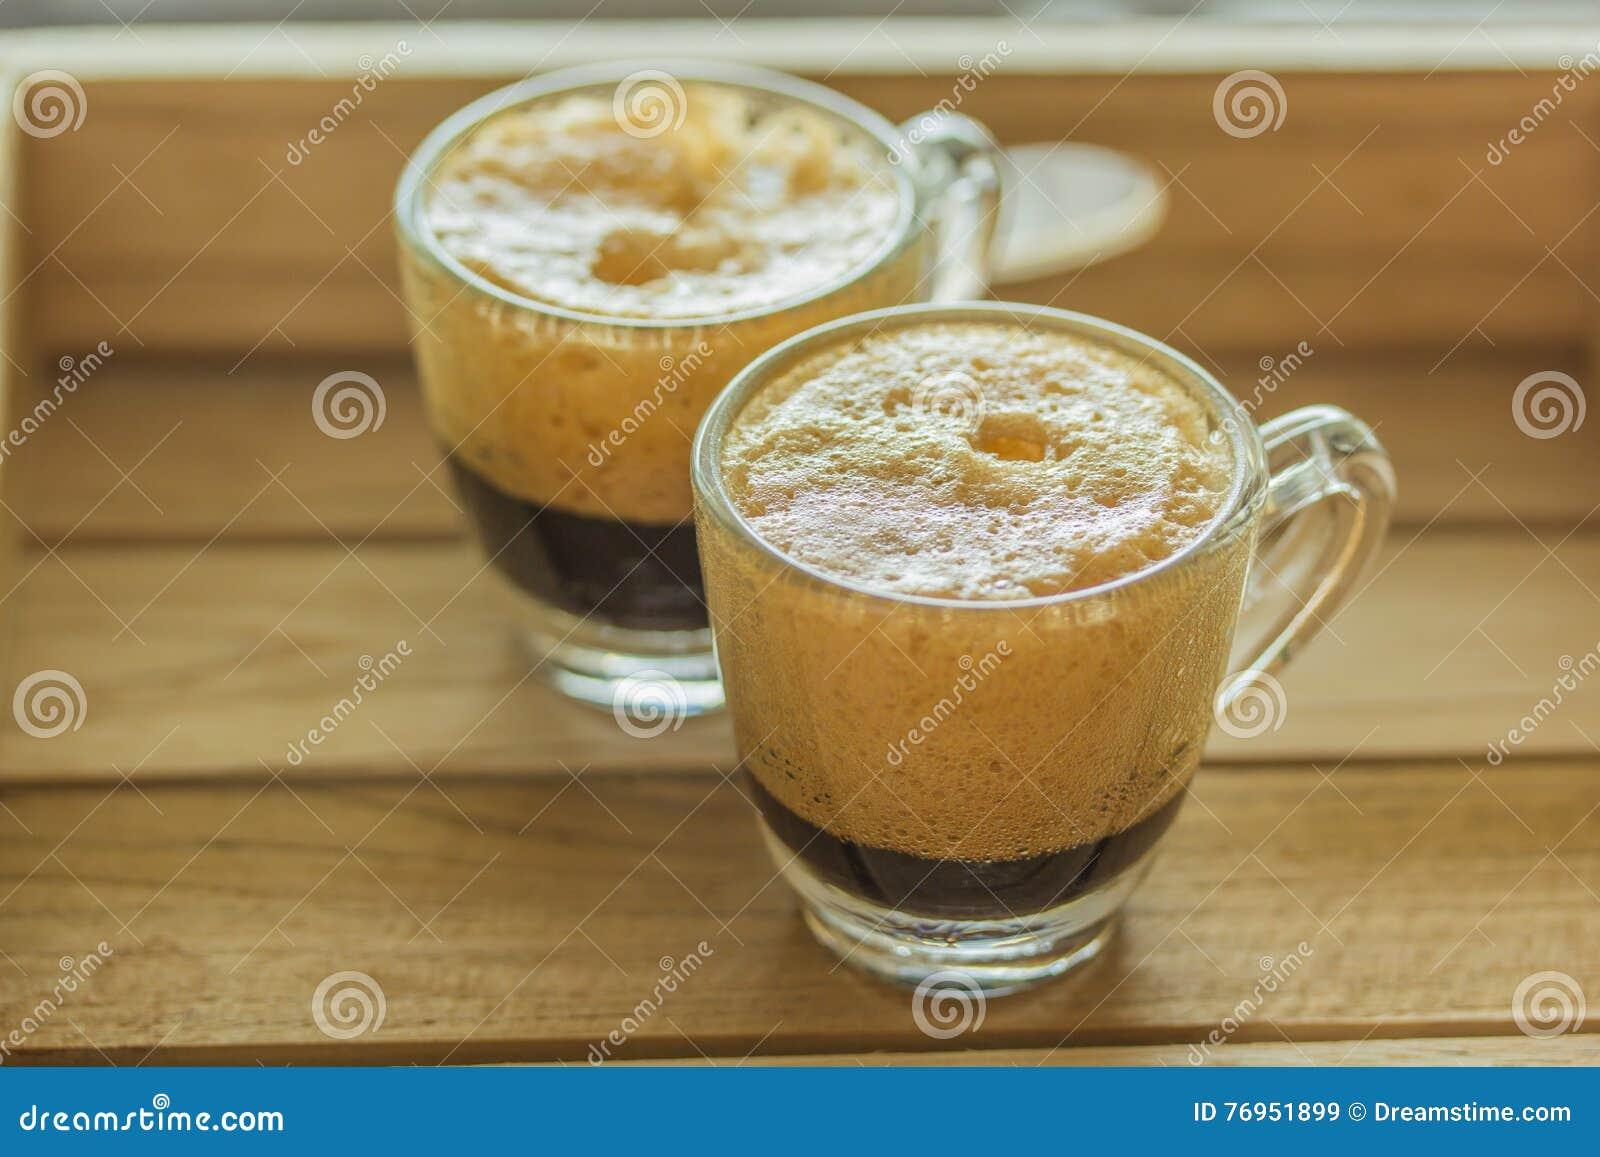 Coffee bubble